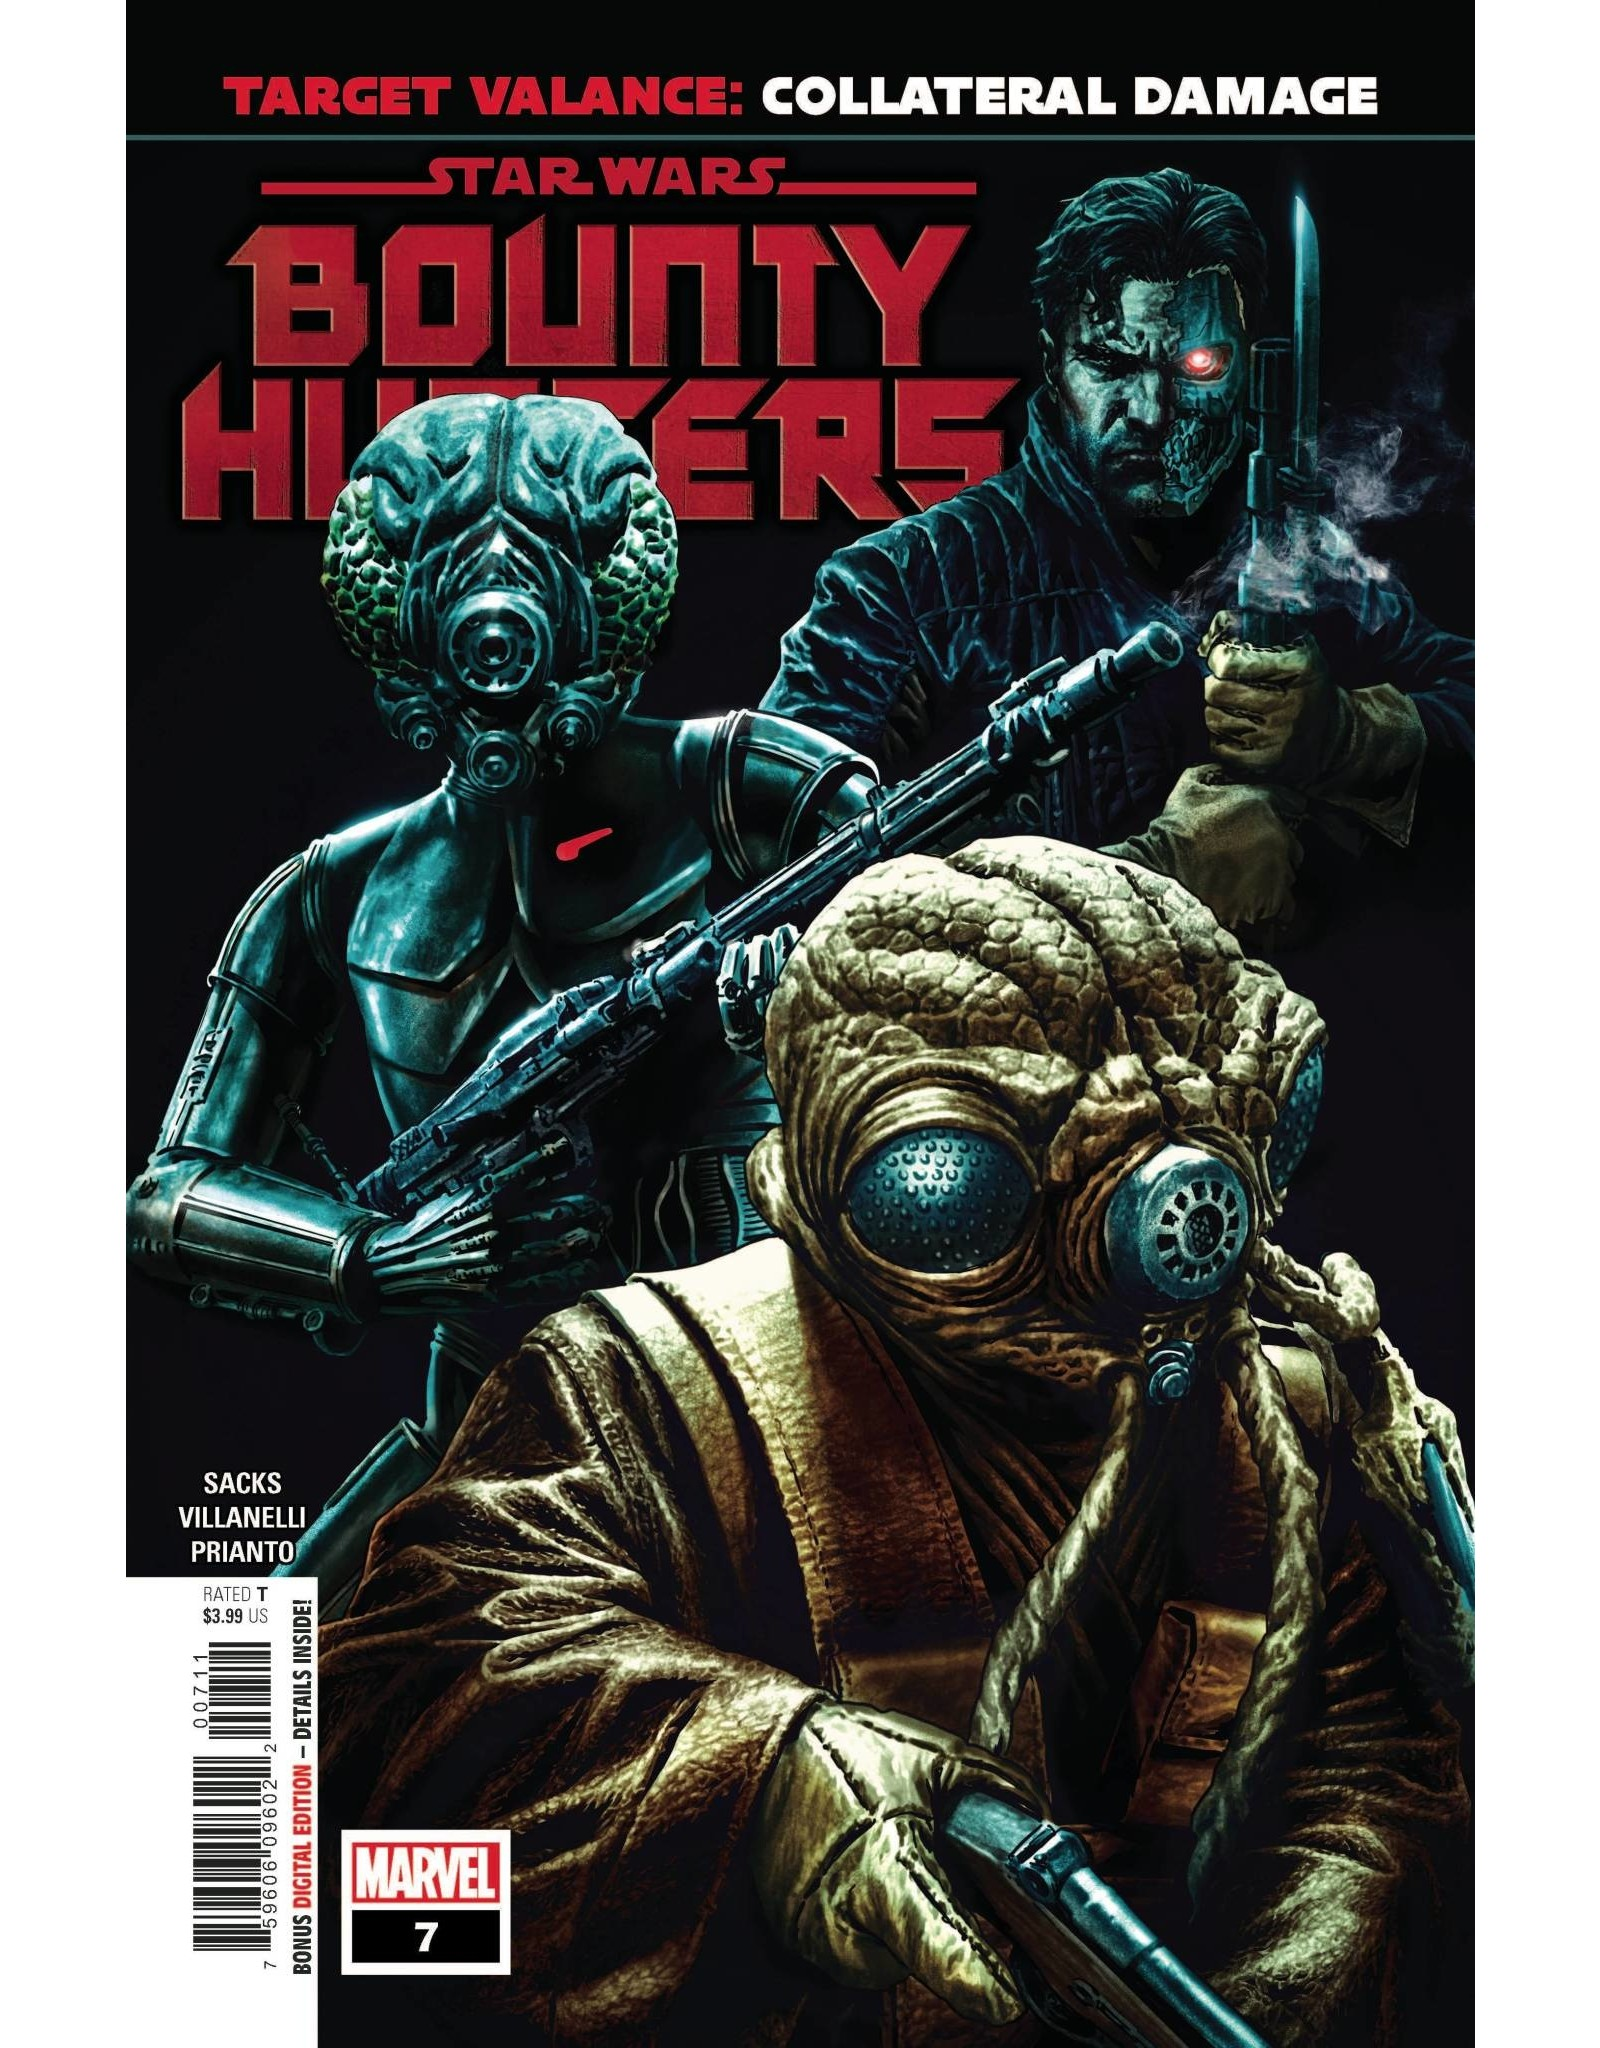 Marvel Comics STAR WARS BOUNTY HUNTERS #7